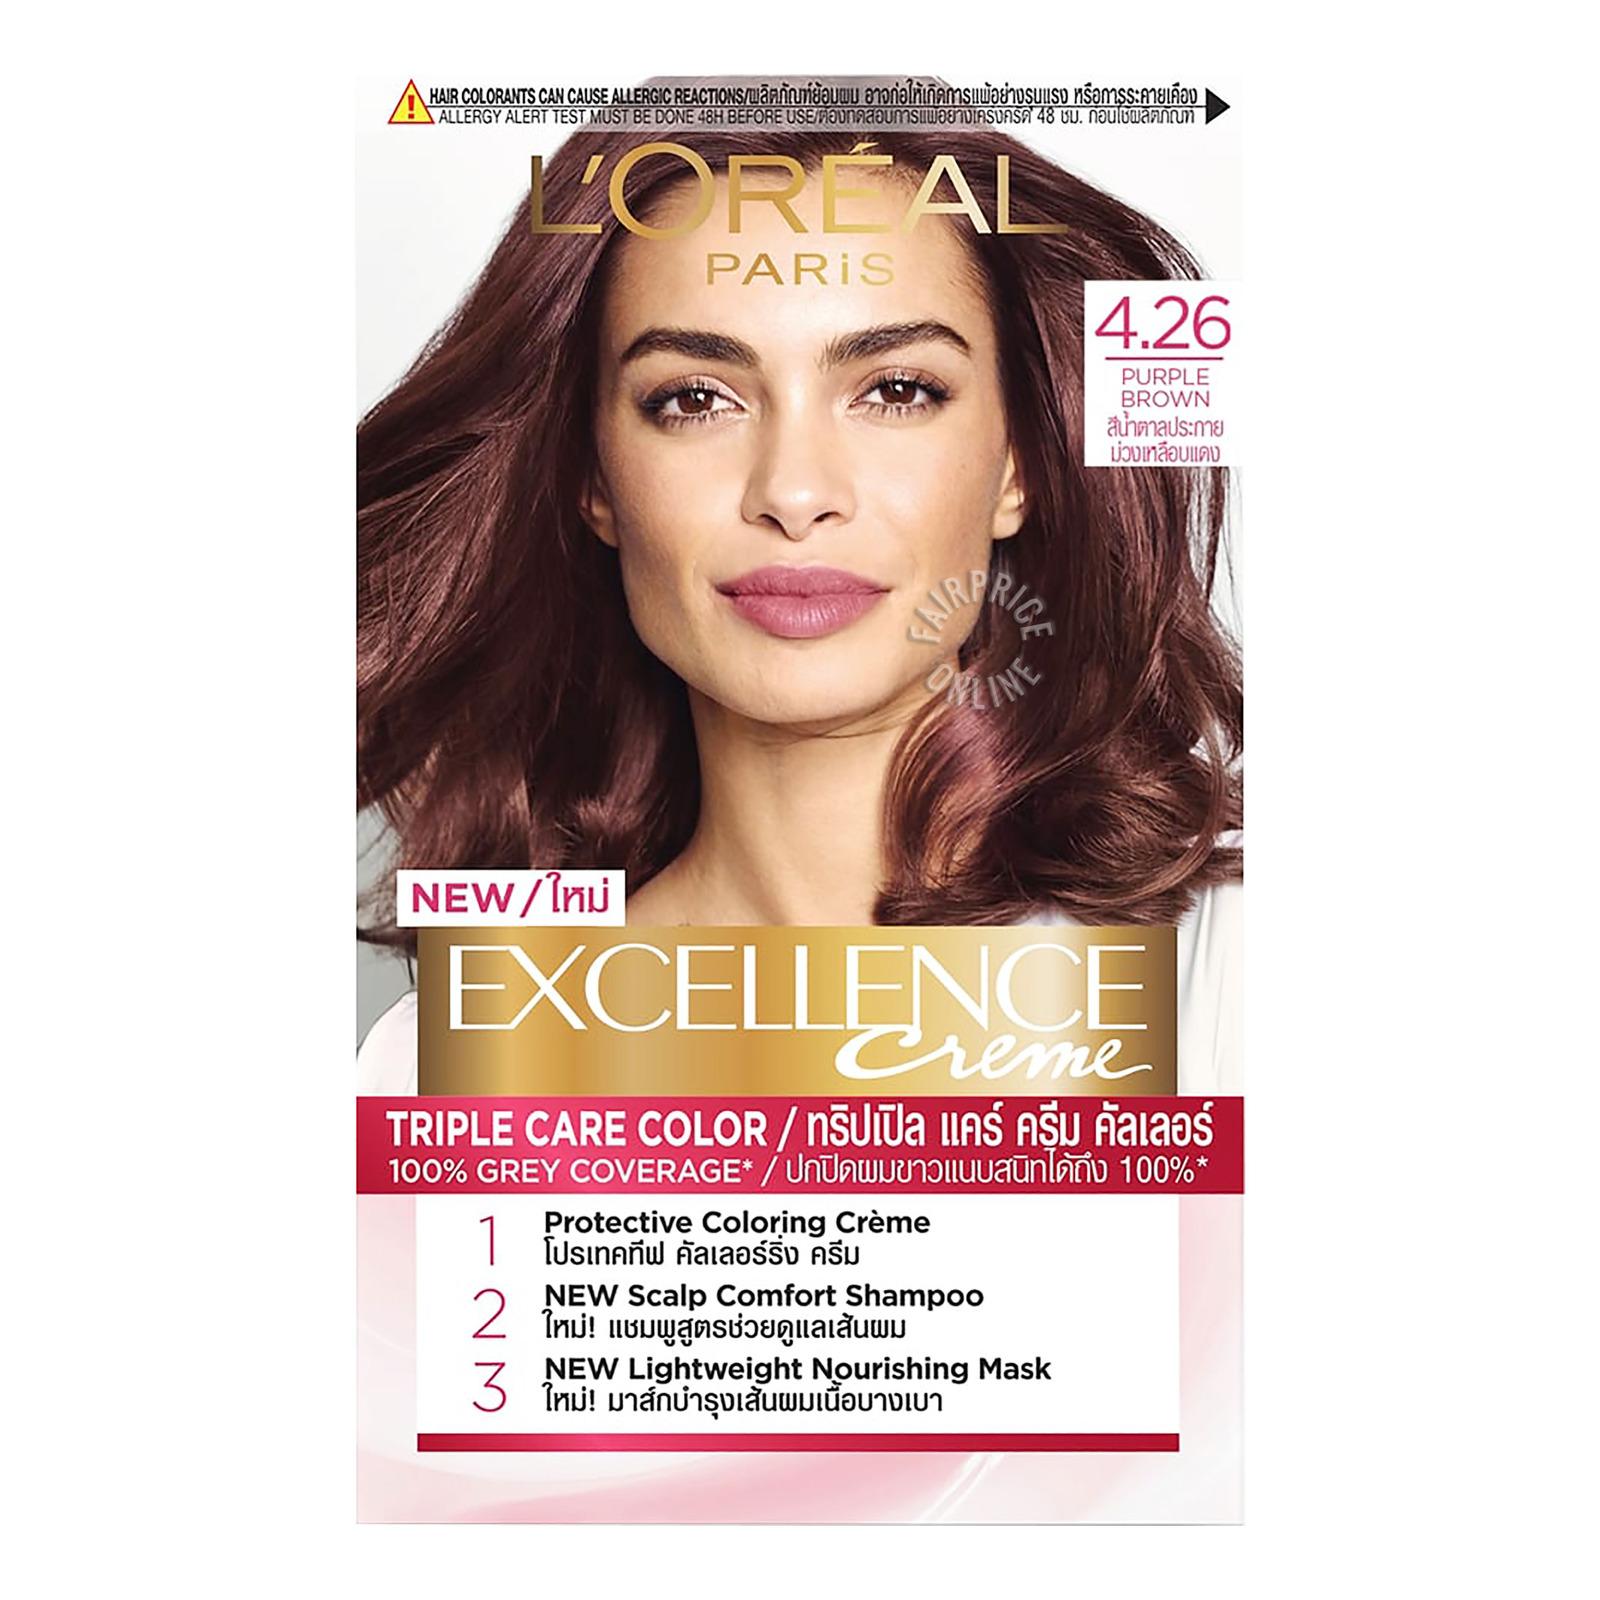 L'Oreal Paris Excellence Creme Hair Dye - 4.26 Purple Brown